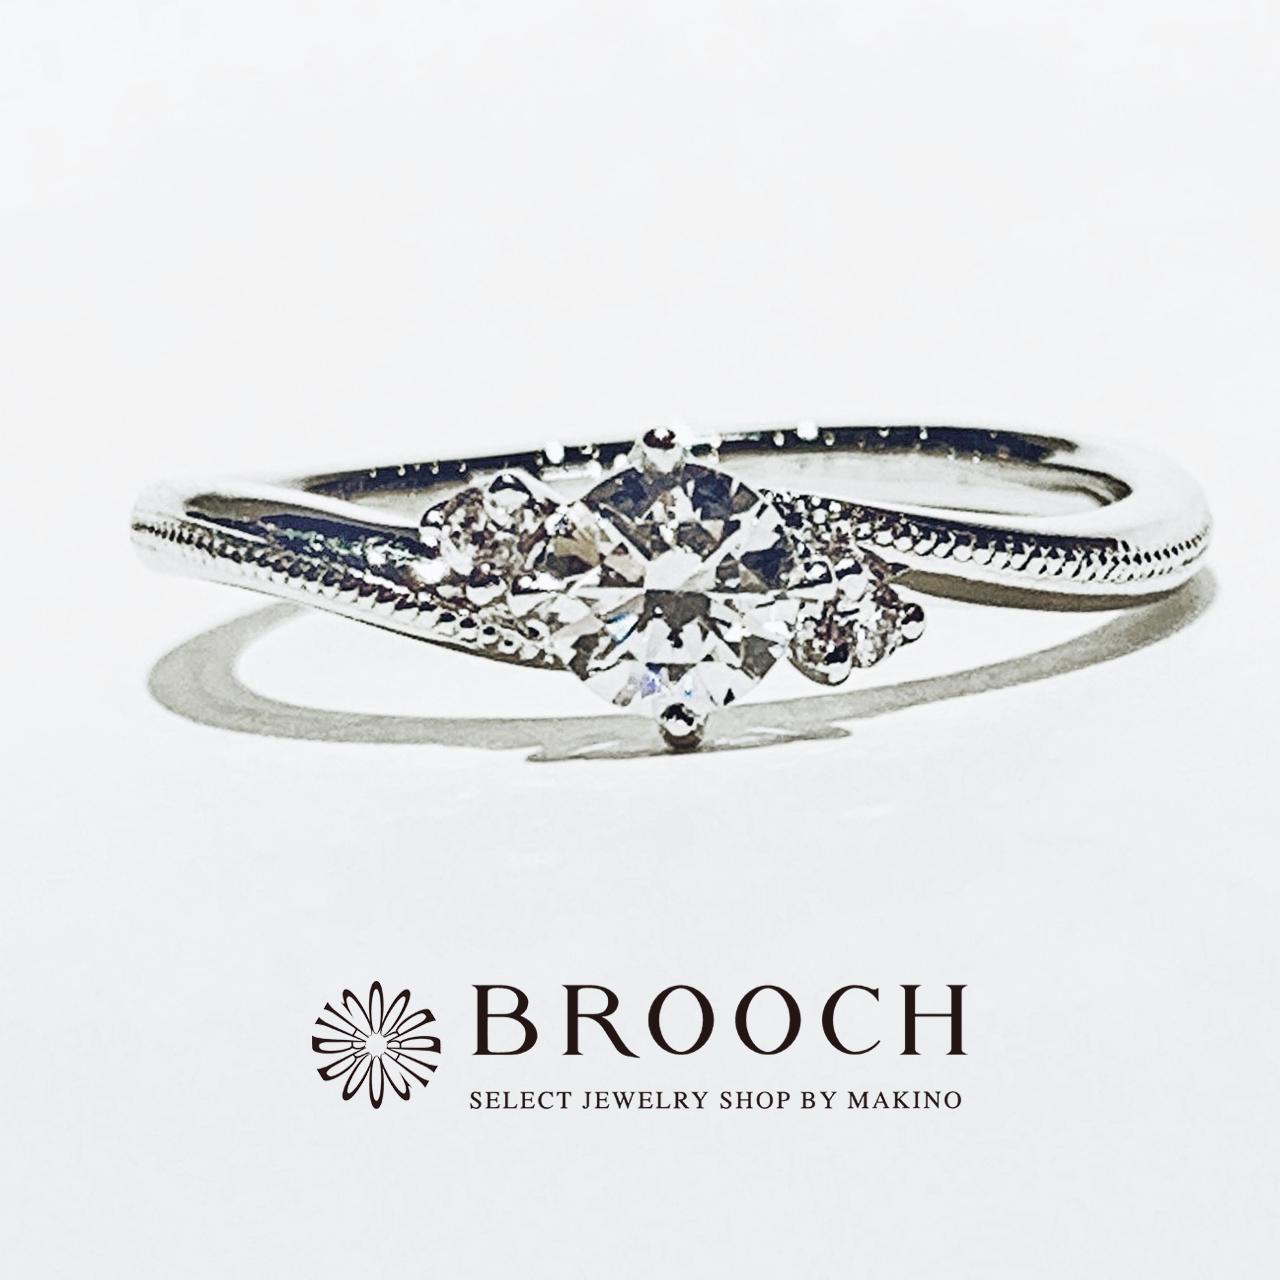 BROOCH 婚約指輪 エンゲージリング かわいい 両サイドメレデザイン